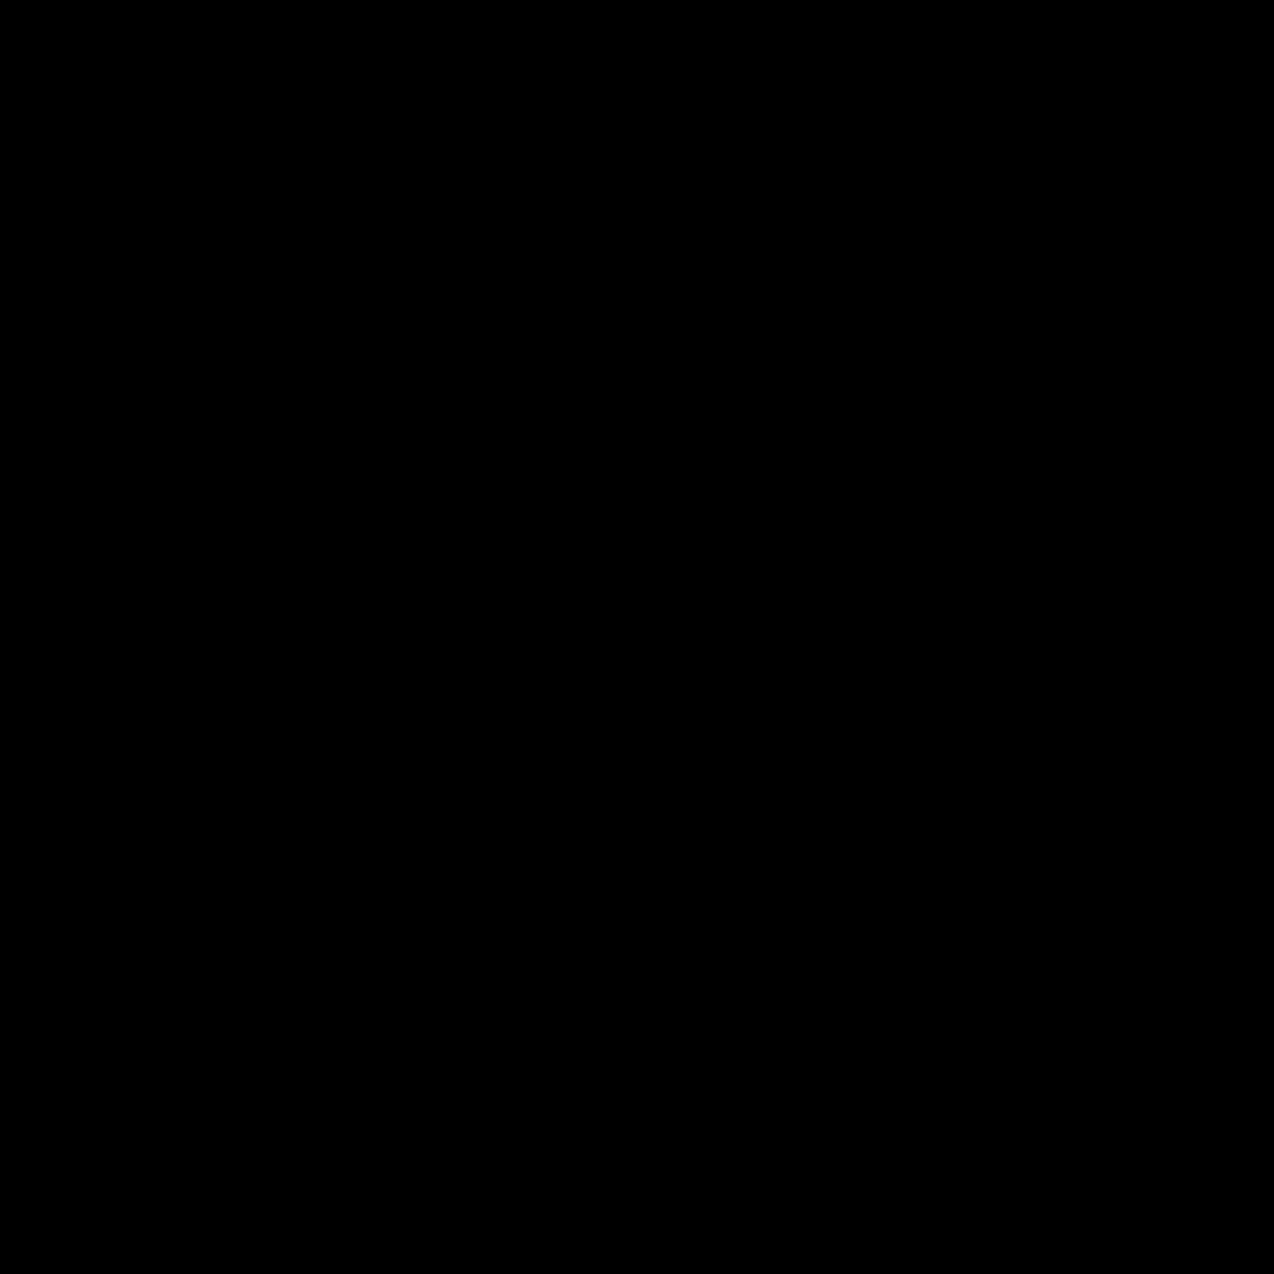 Logorond